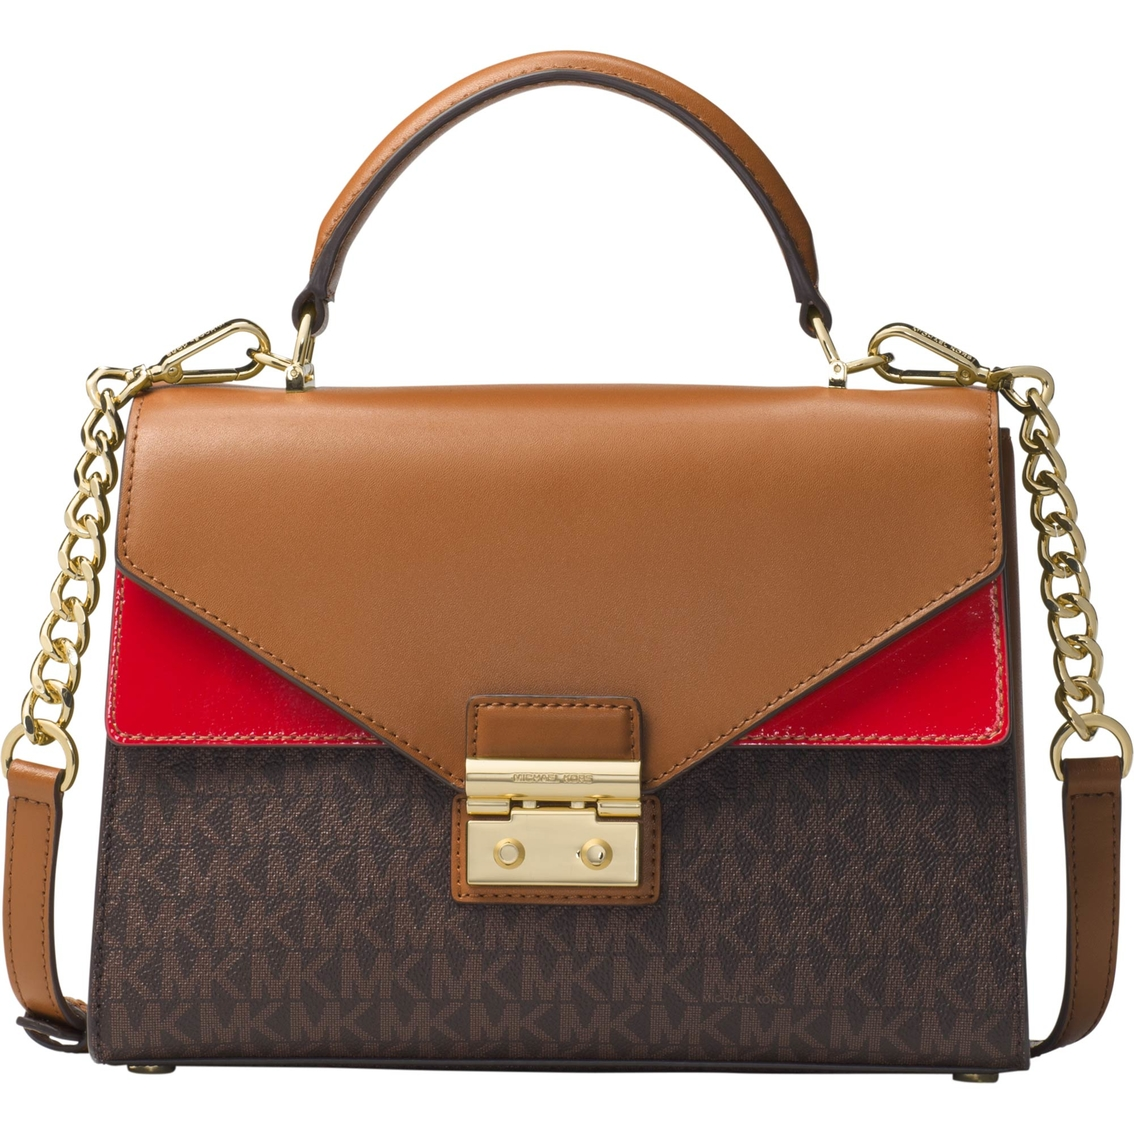 2a1000fc0f1395 Michael Kors Sloan Medium Double Flap Top Handle Satchel | Handbags ...